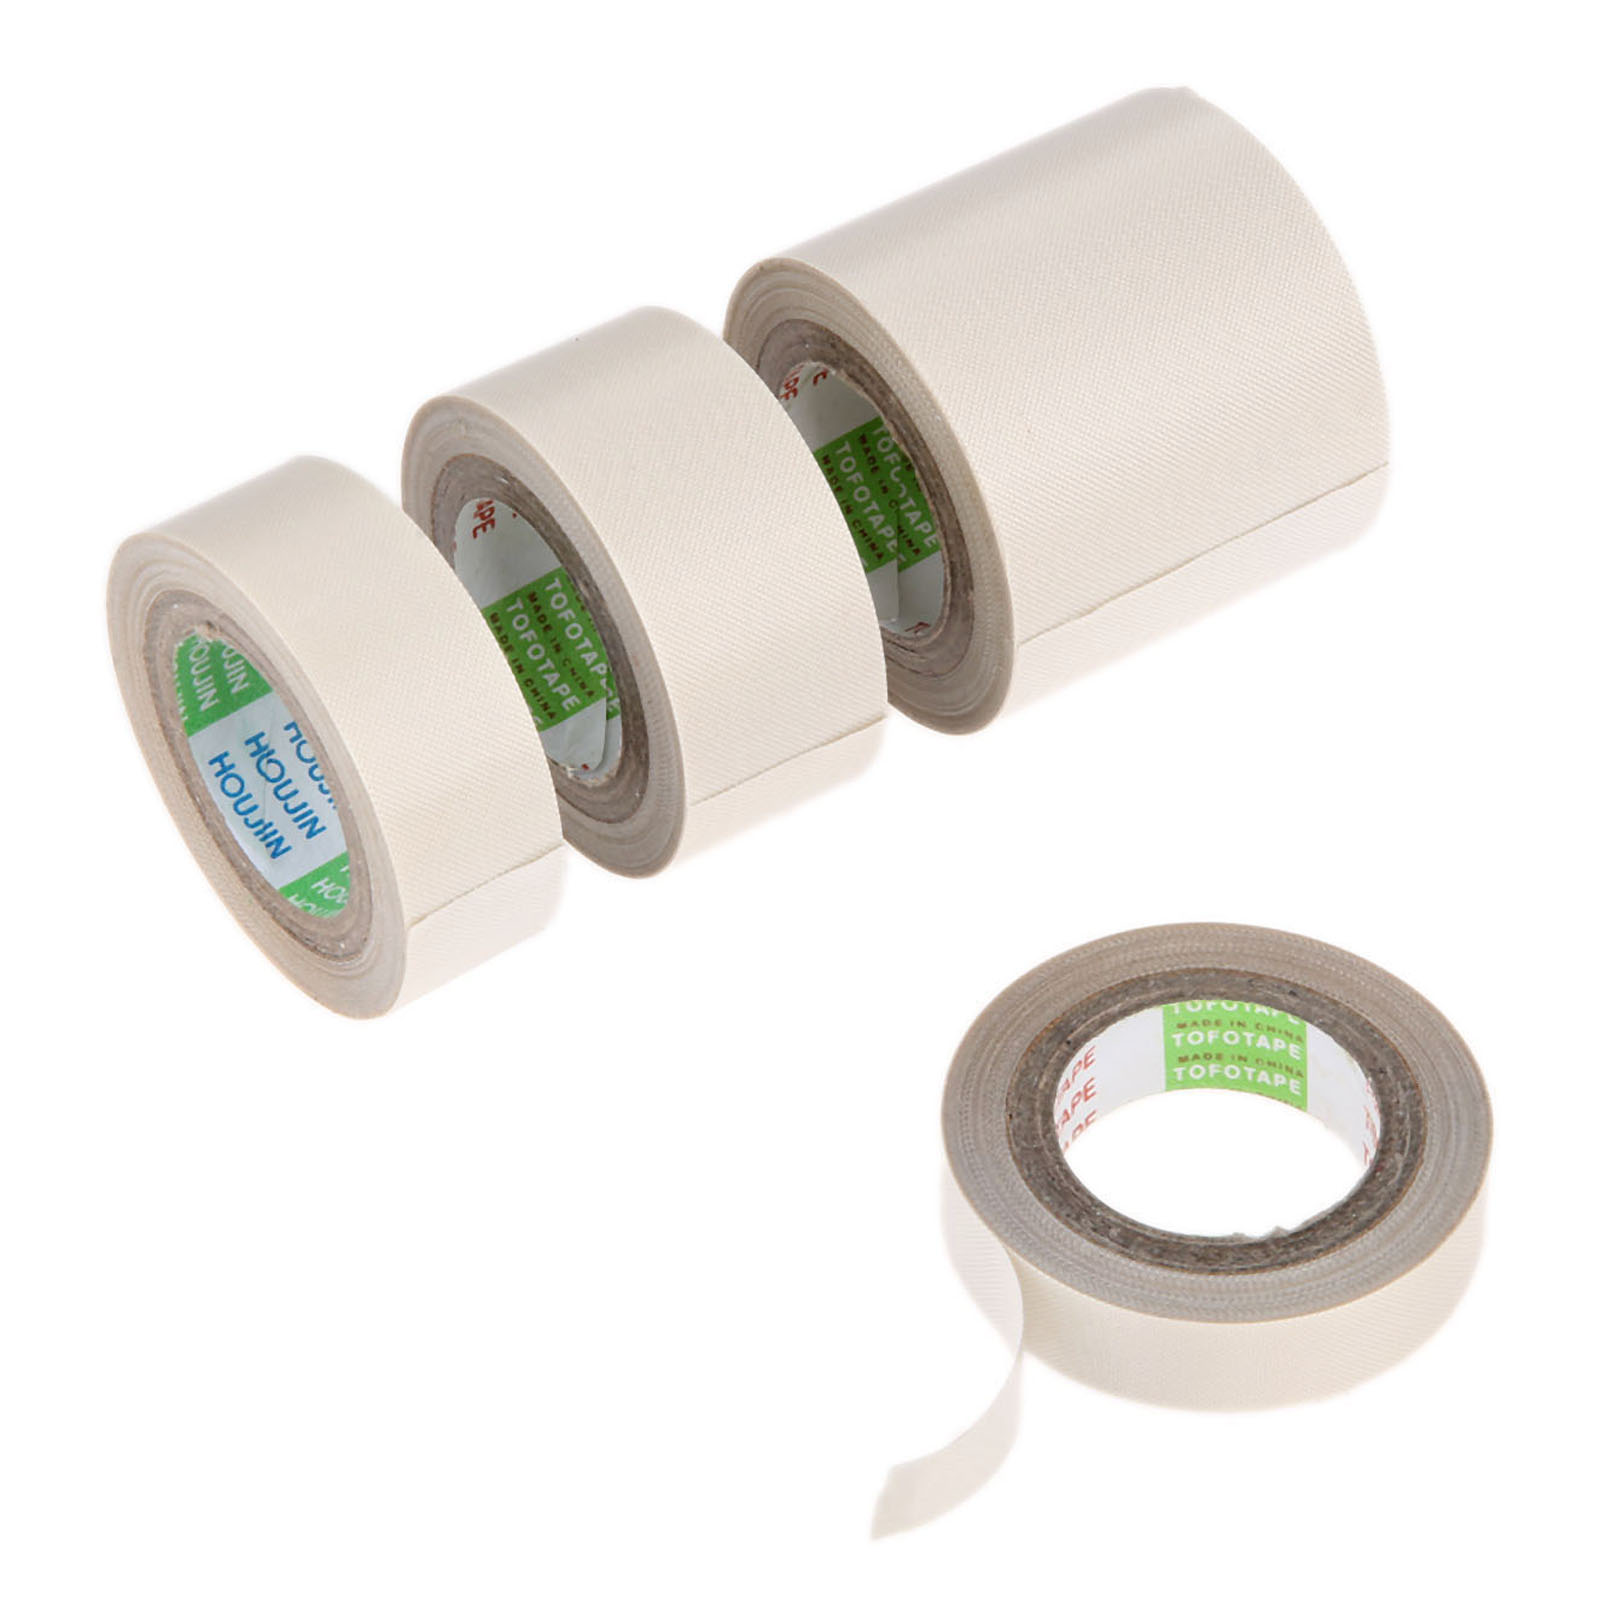 10m Long 0.13mm Thick PTFE High Temperature Heat-Resistant Adhesive Tape 13/19/25/50mm Wide Fiberglass Vacuum Sealing Tape10m Long 0.13mm Thick PTFE High Temperature Heat-Resistant Adhesive Tape 13/19/25/50mm Wide Fiberglass Vacuum Sealing Tape